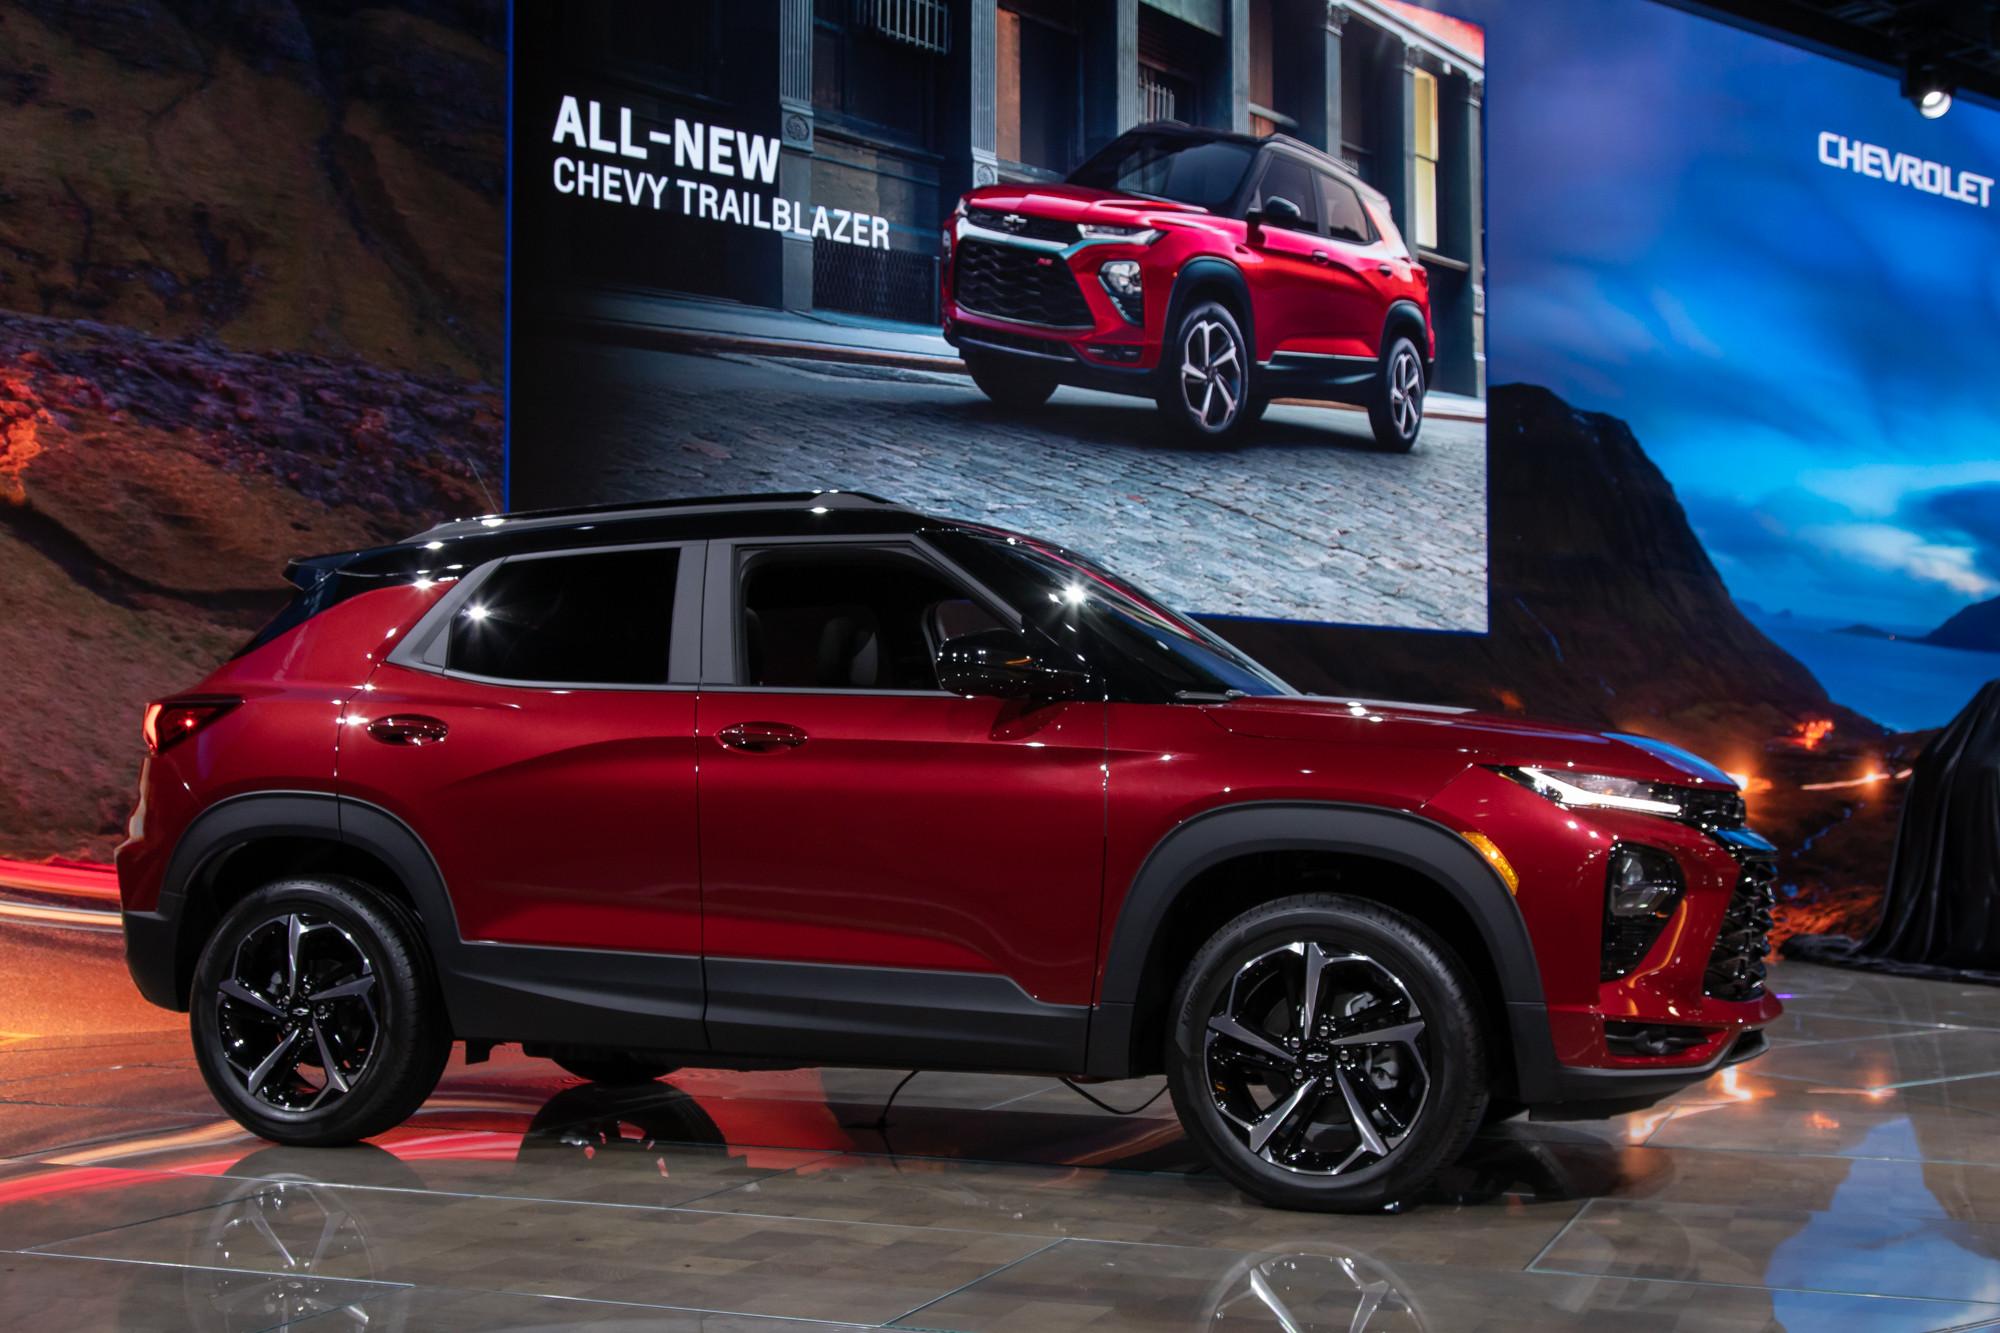 2021 Chevrolet Trailblazer: Taking the Road More Traveled ...